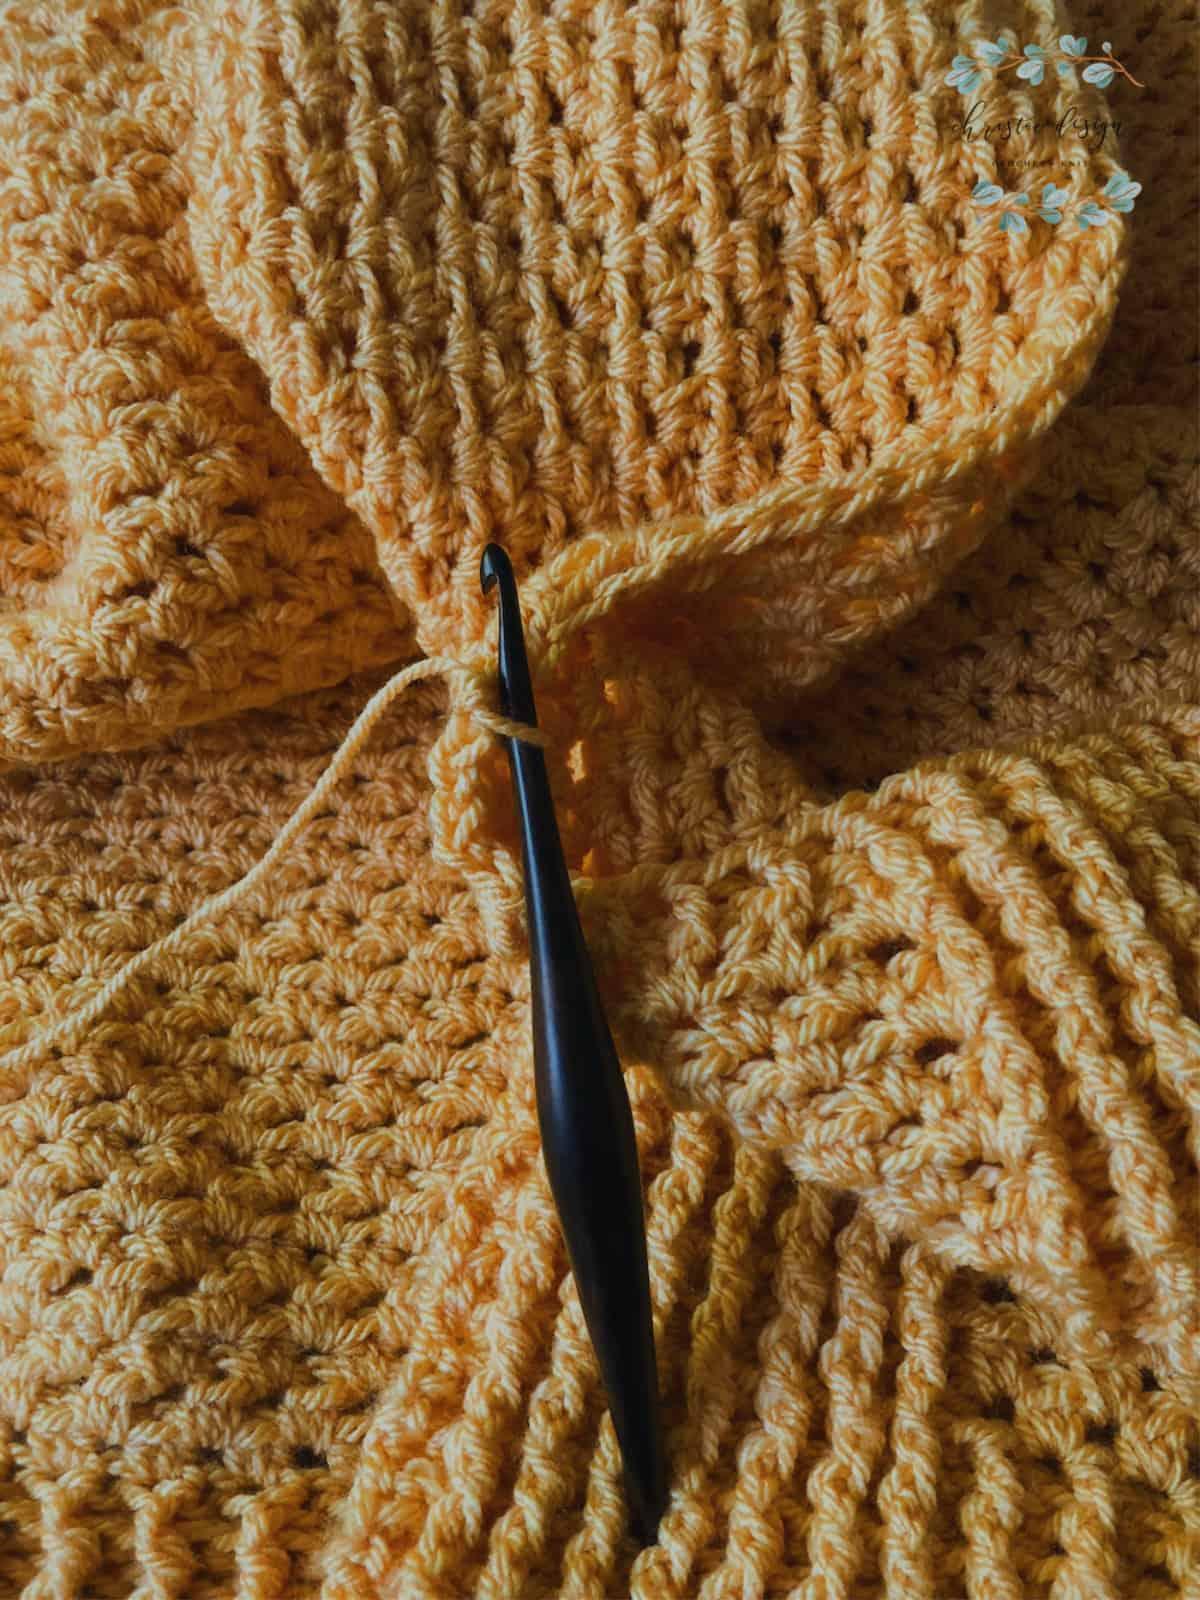 picture of orange blanket and wood crochet hook